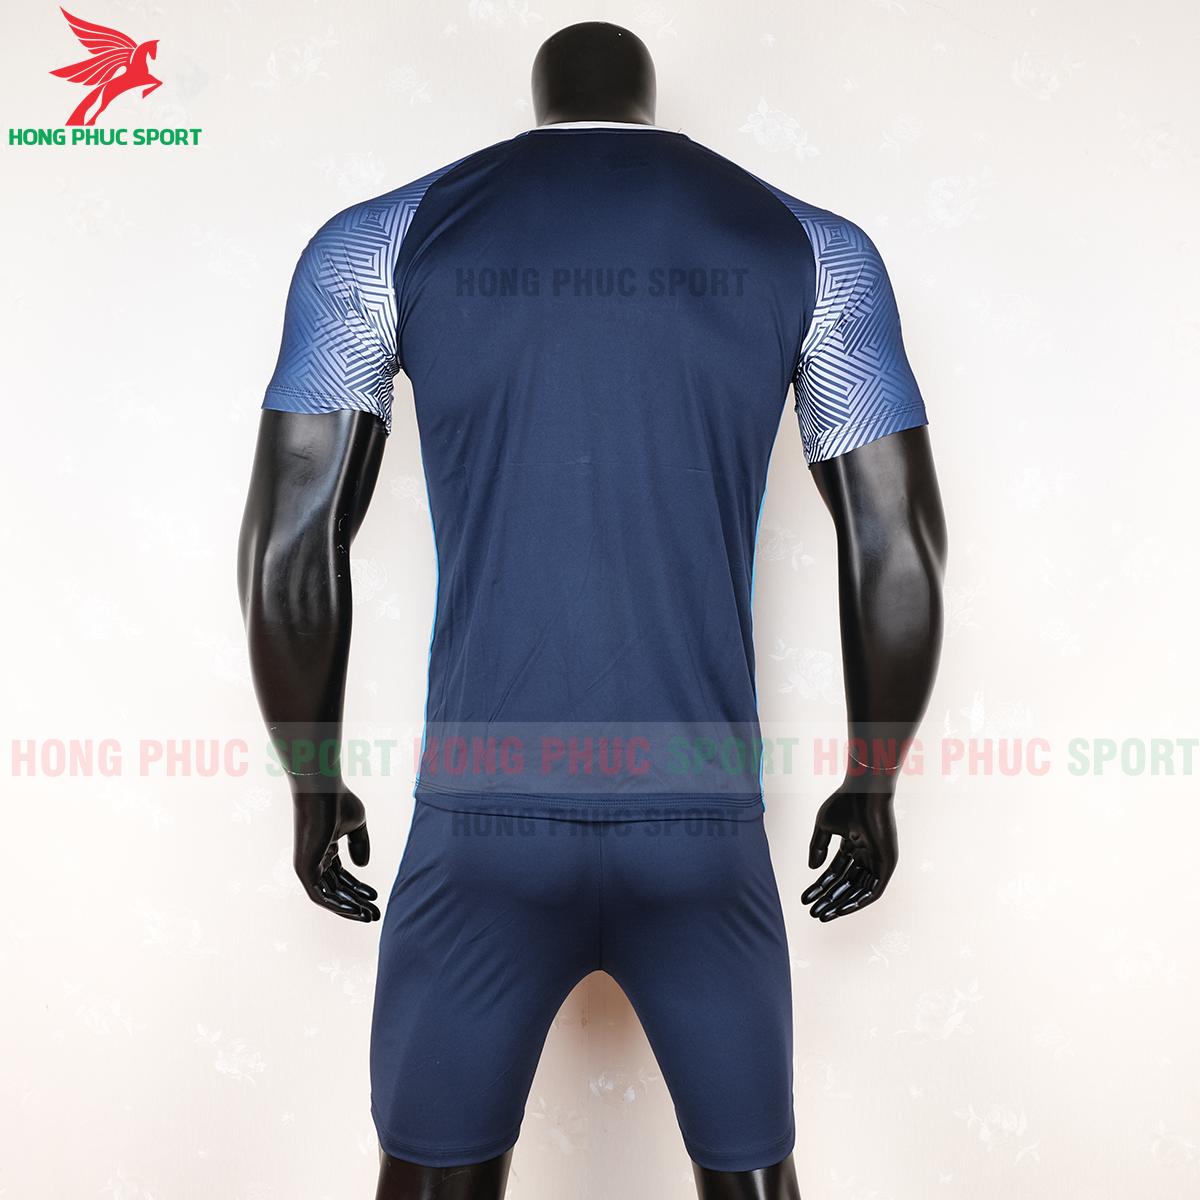 https://cdn.hongphucsport.com/unsafe/s4.shopbay.vn/files/285/ao-bong-da-riki-quator-xanh-bich-5-5f71b501790a3.png